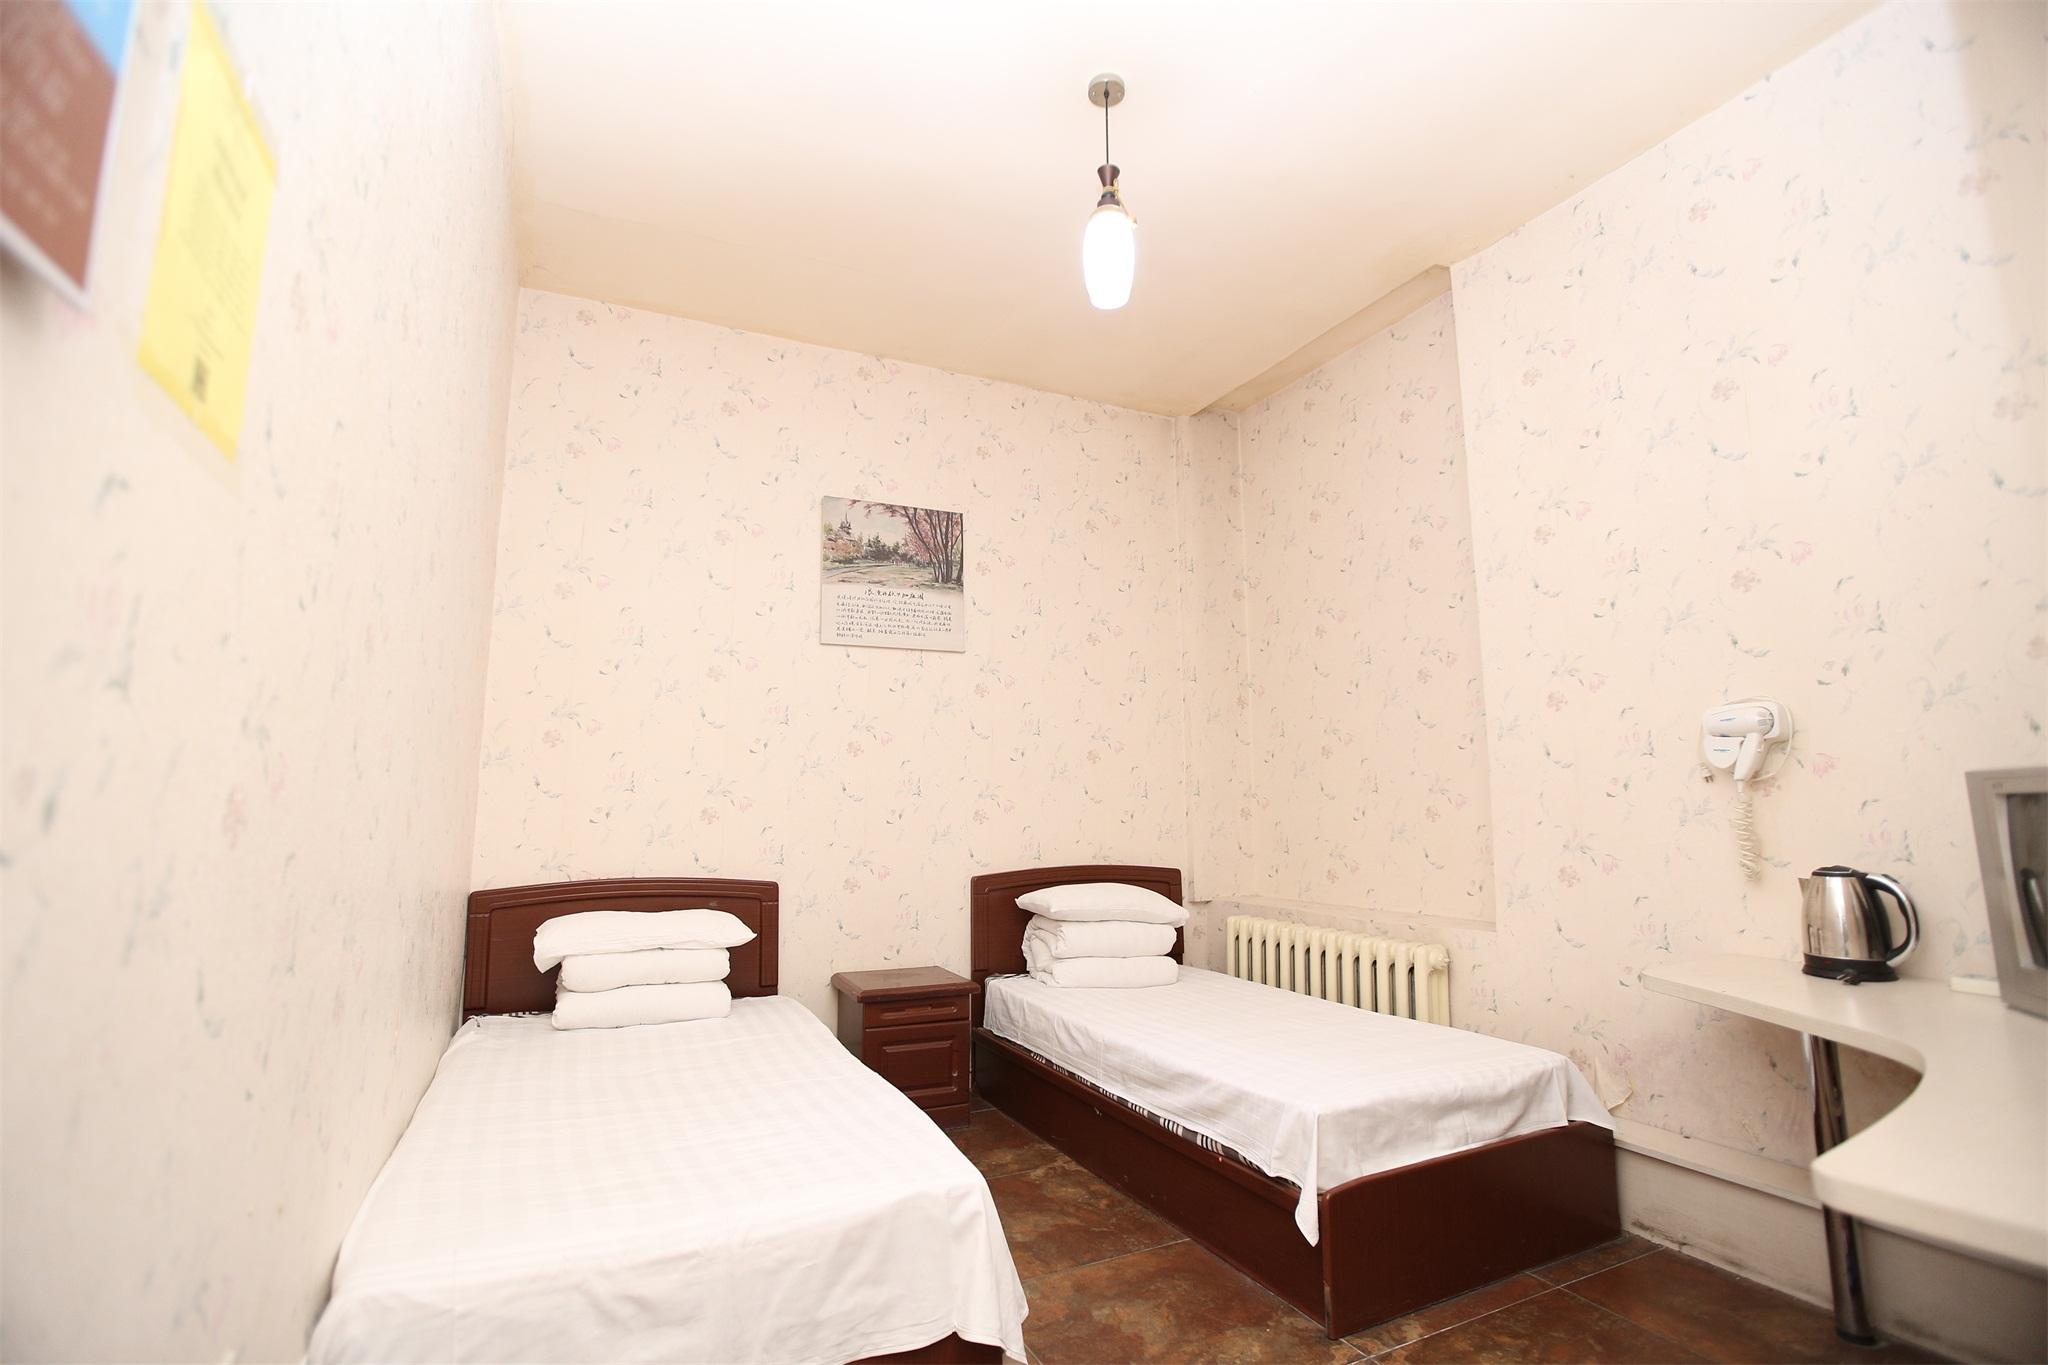 Kazy International Youth Hostel Harbin